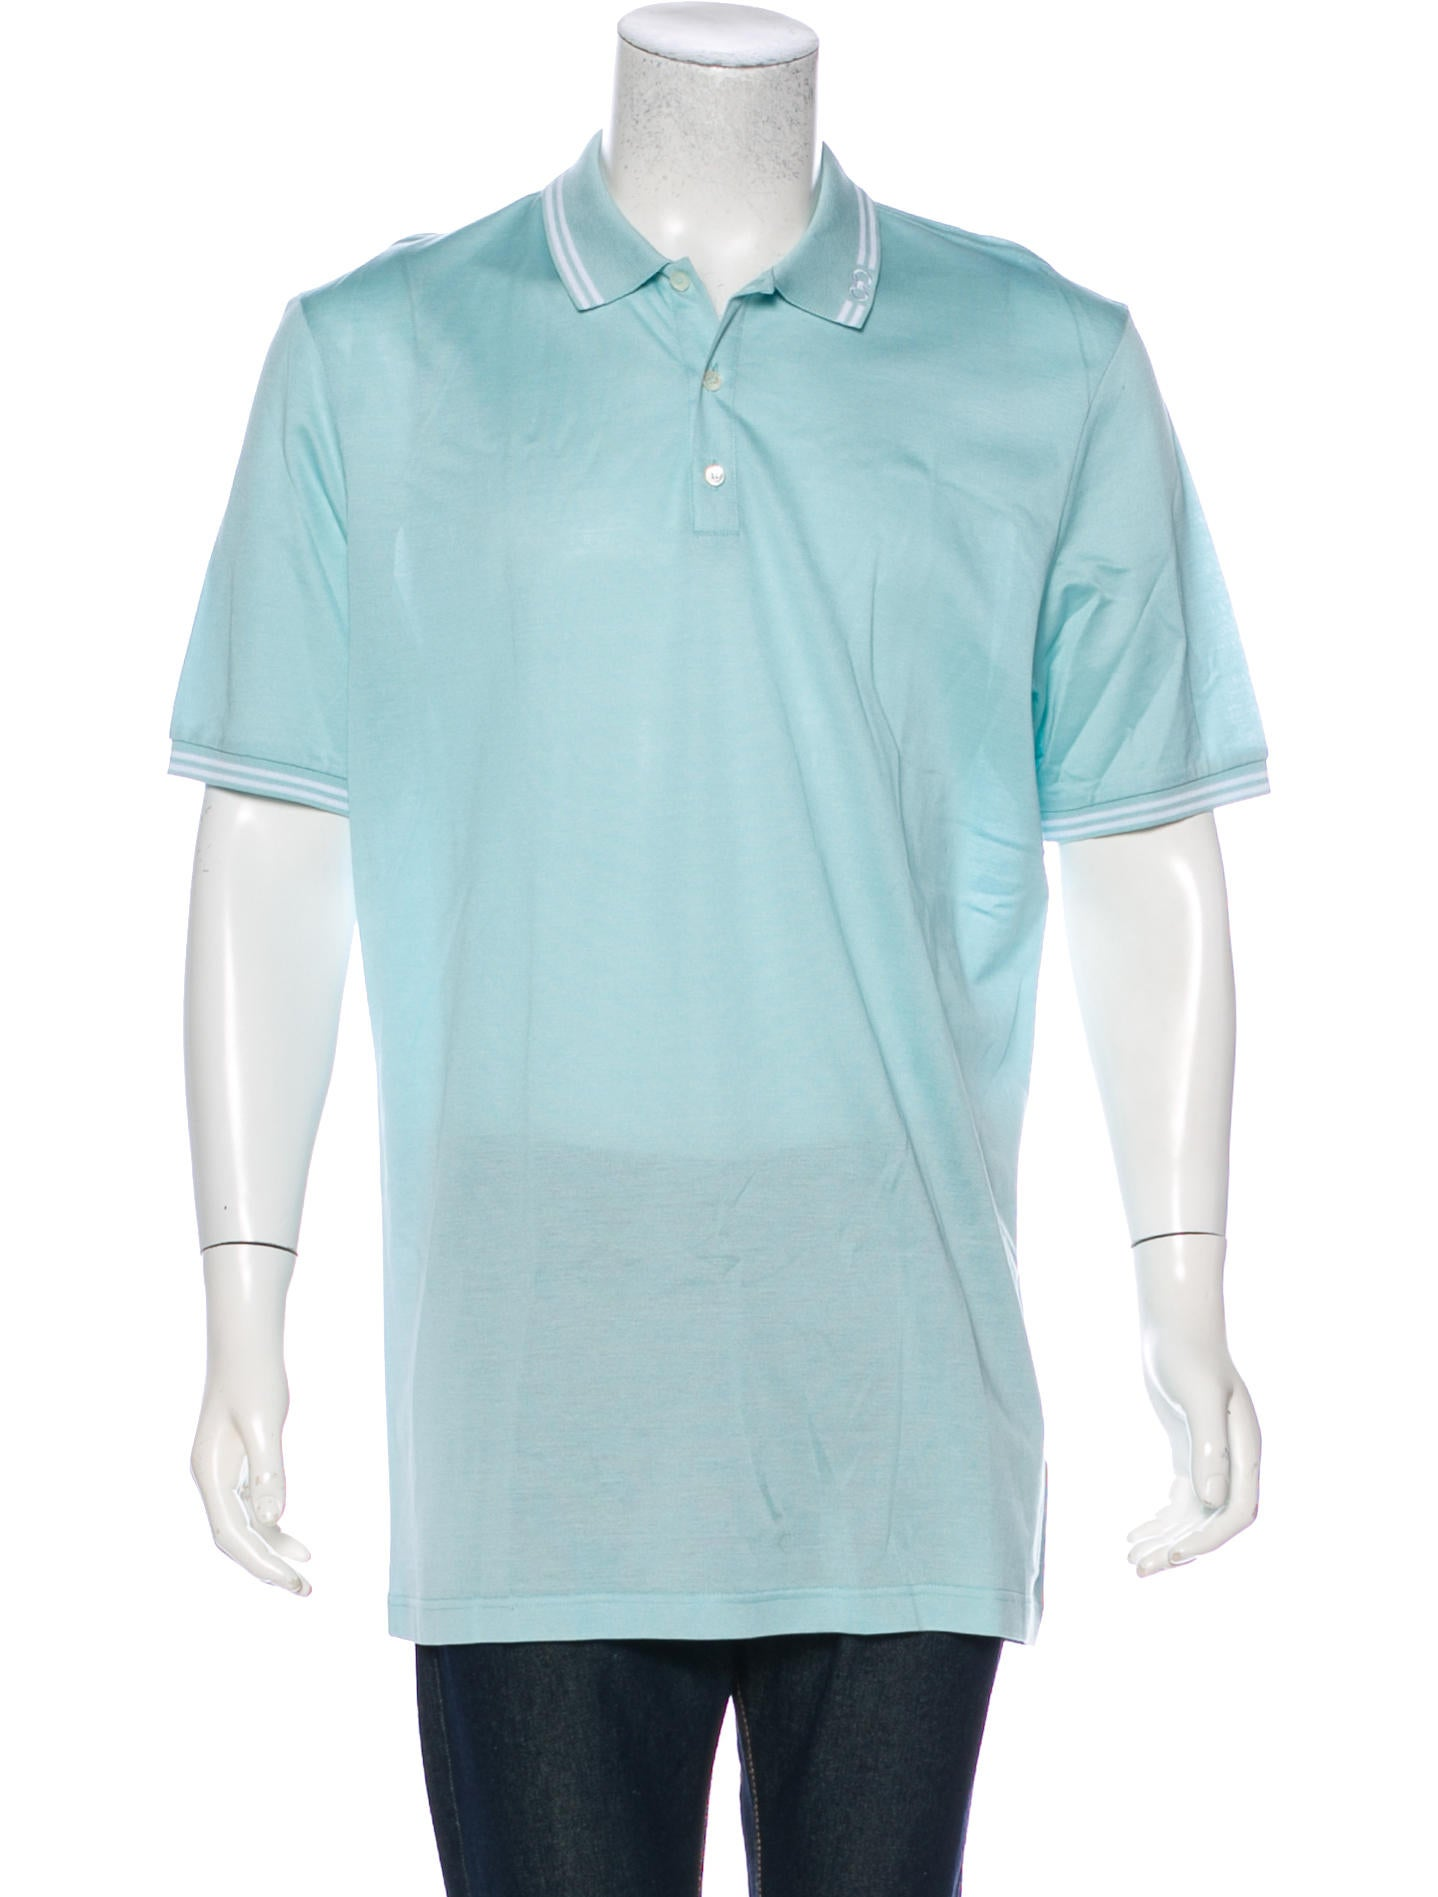 Salvatore Ferragamo Gancini Embroidered Collar Polo Shirt Clothing